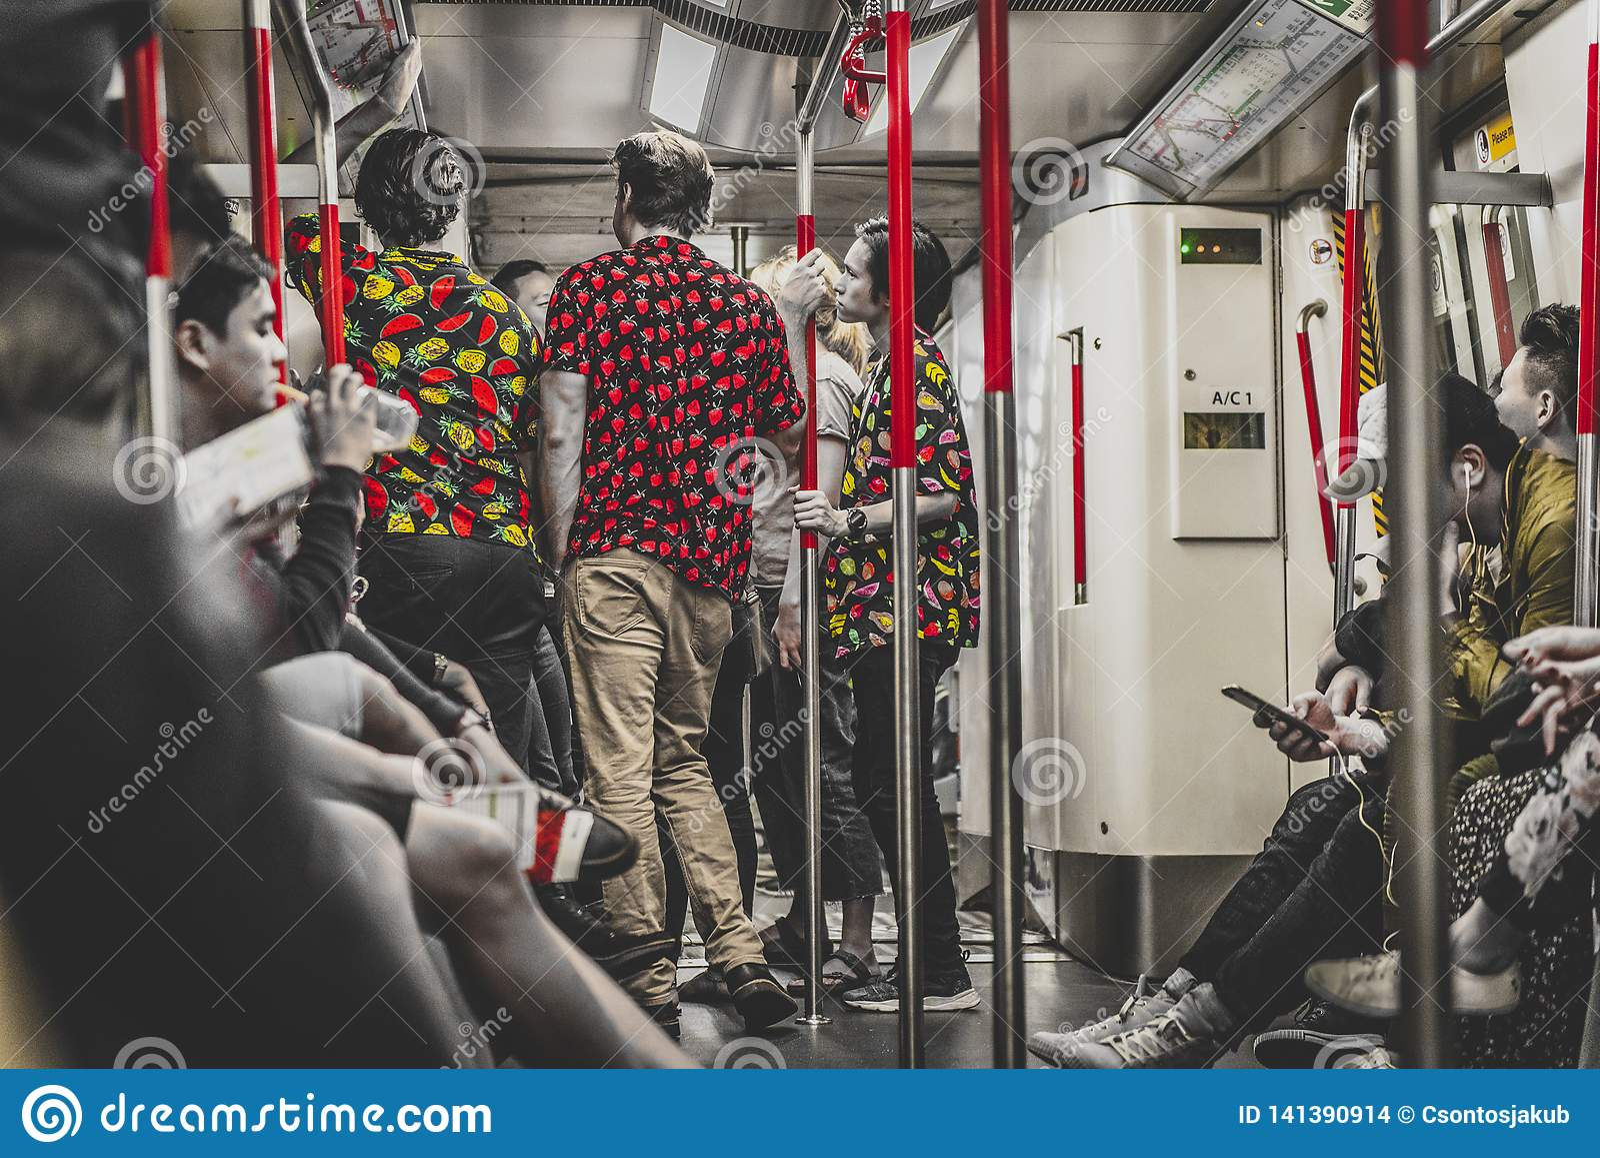 Honk Kong, Listopad 2018 - ludzie w metrze